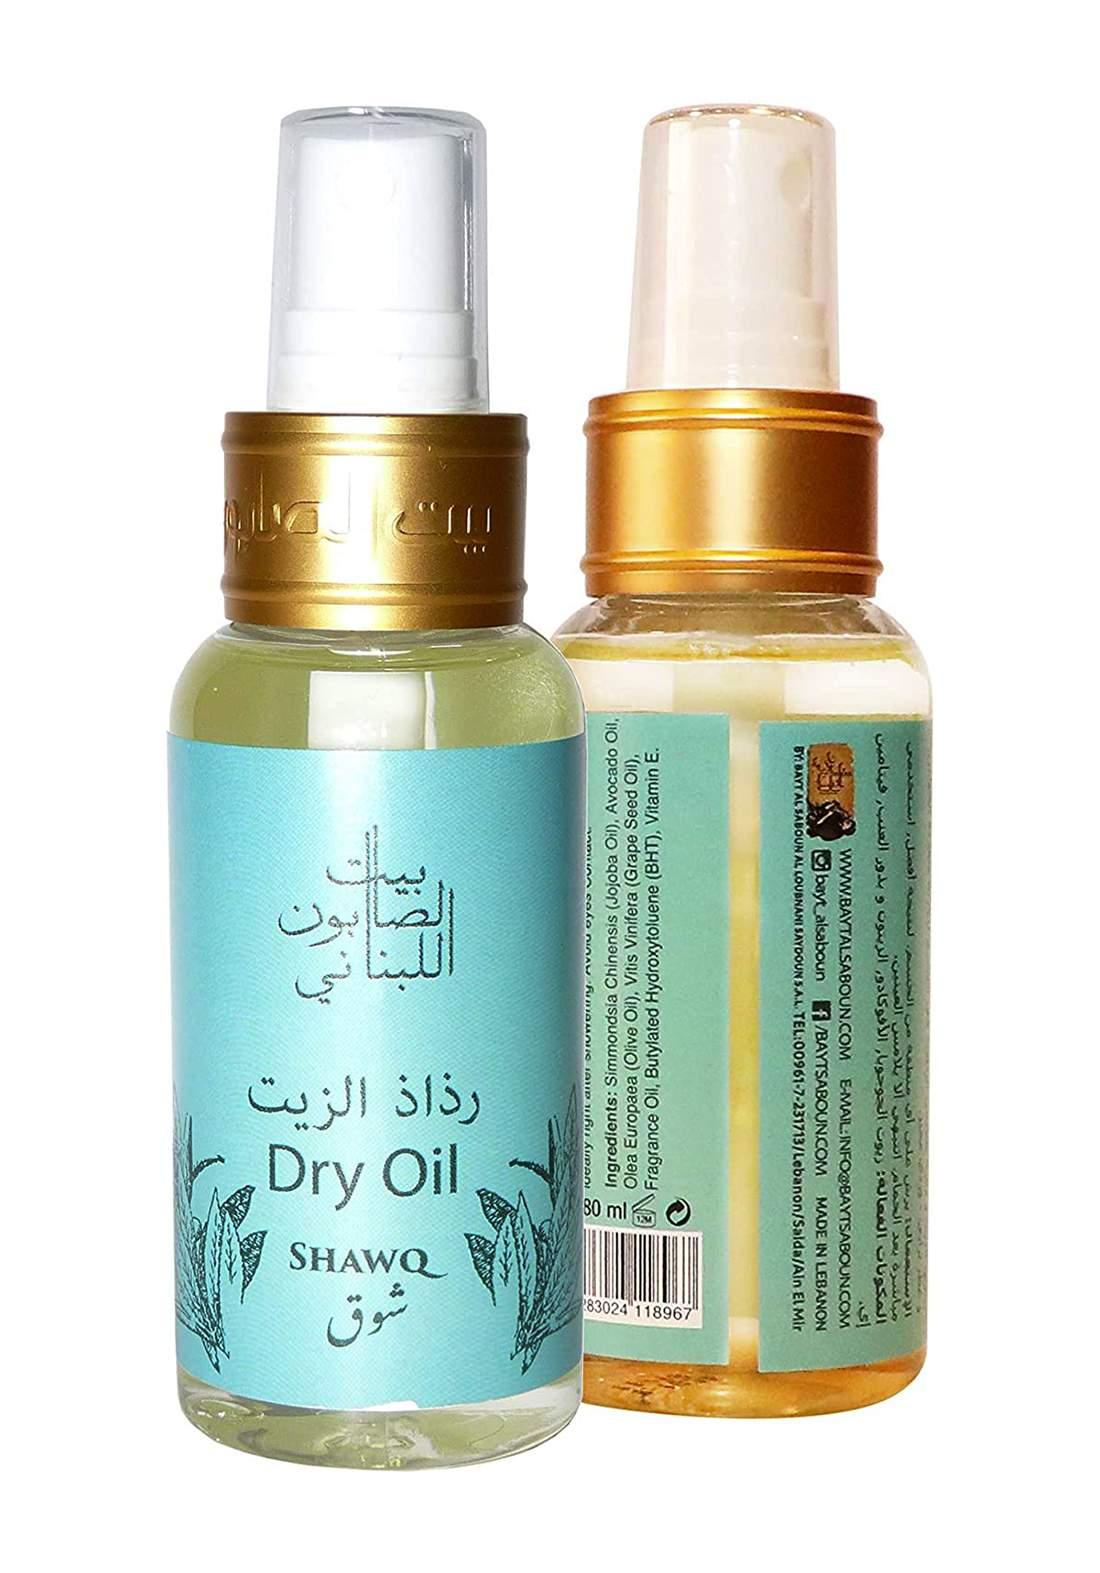 Bayt Alsaboun Alloubnani-317485 Dry Oil Shawq 80 Ml زيت للشعر